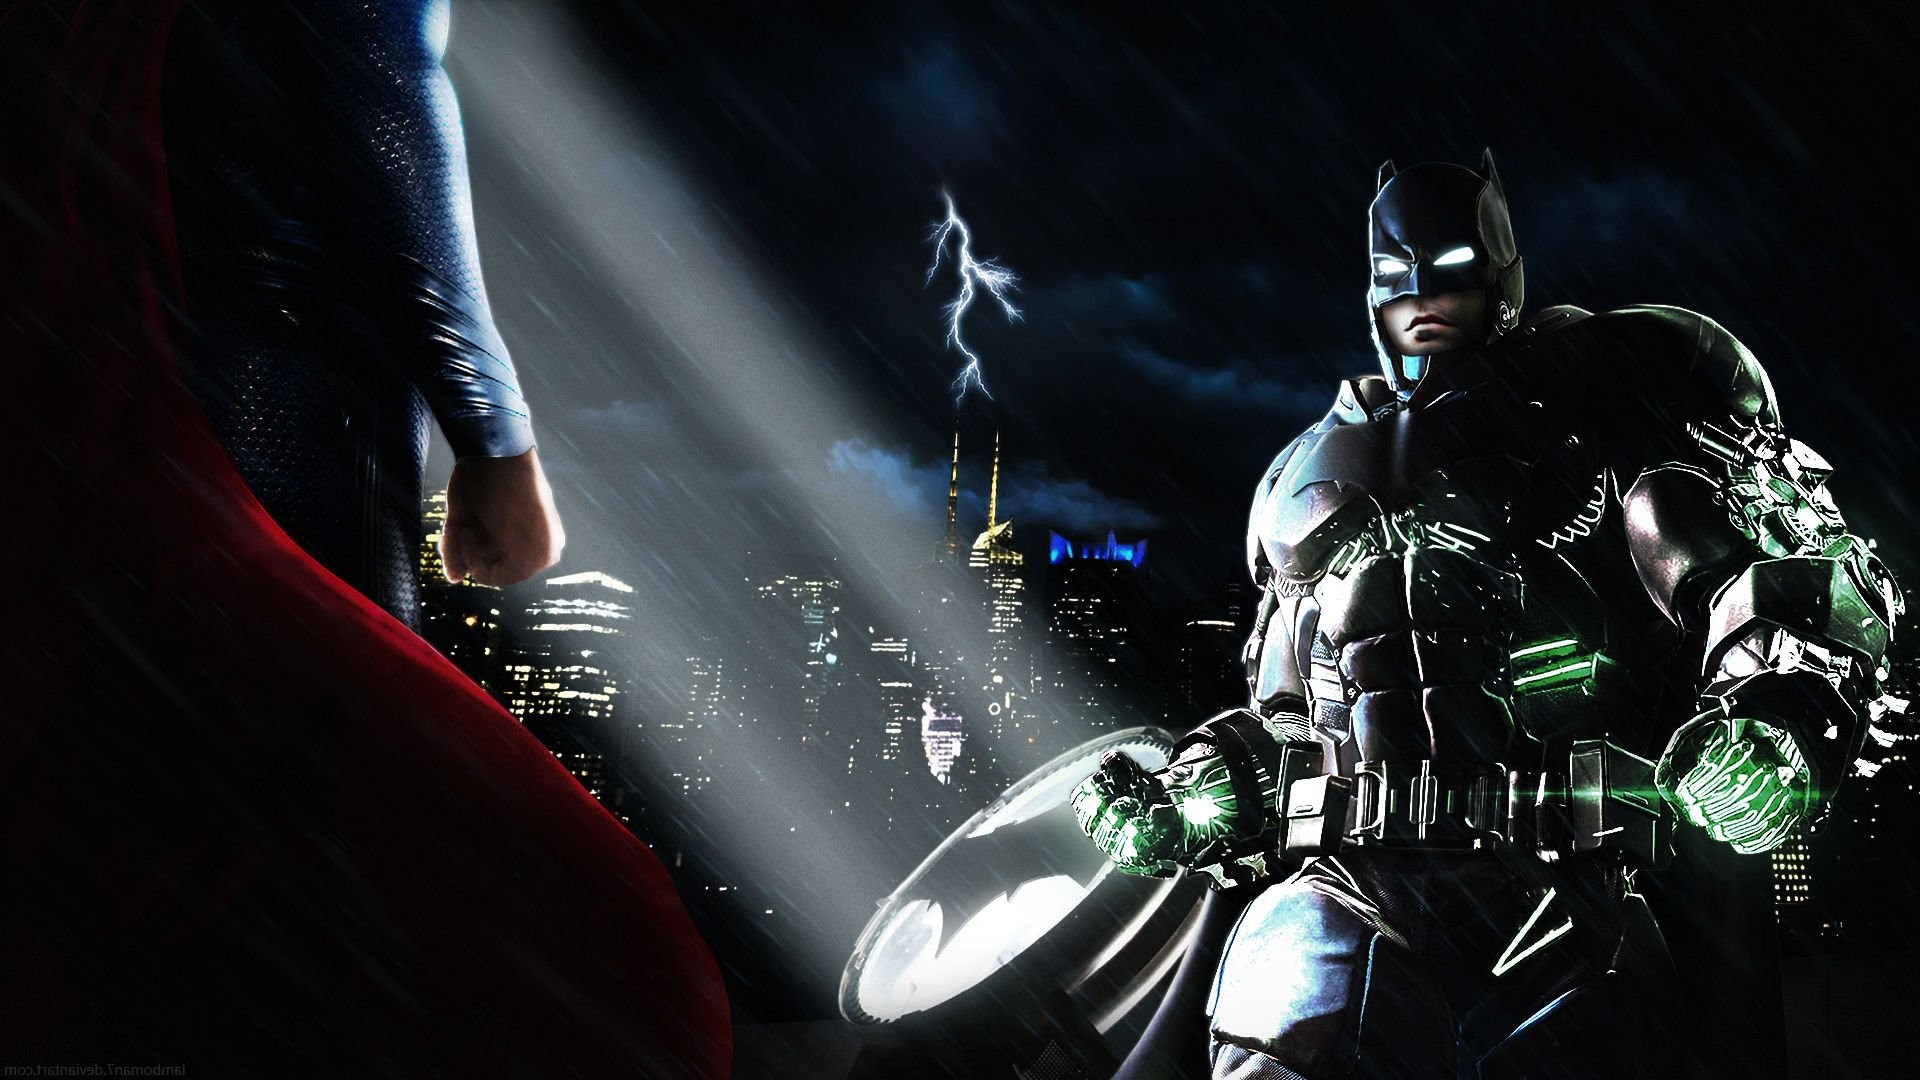 2000x1126 Batman V Superman Dawn Of Justice Background